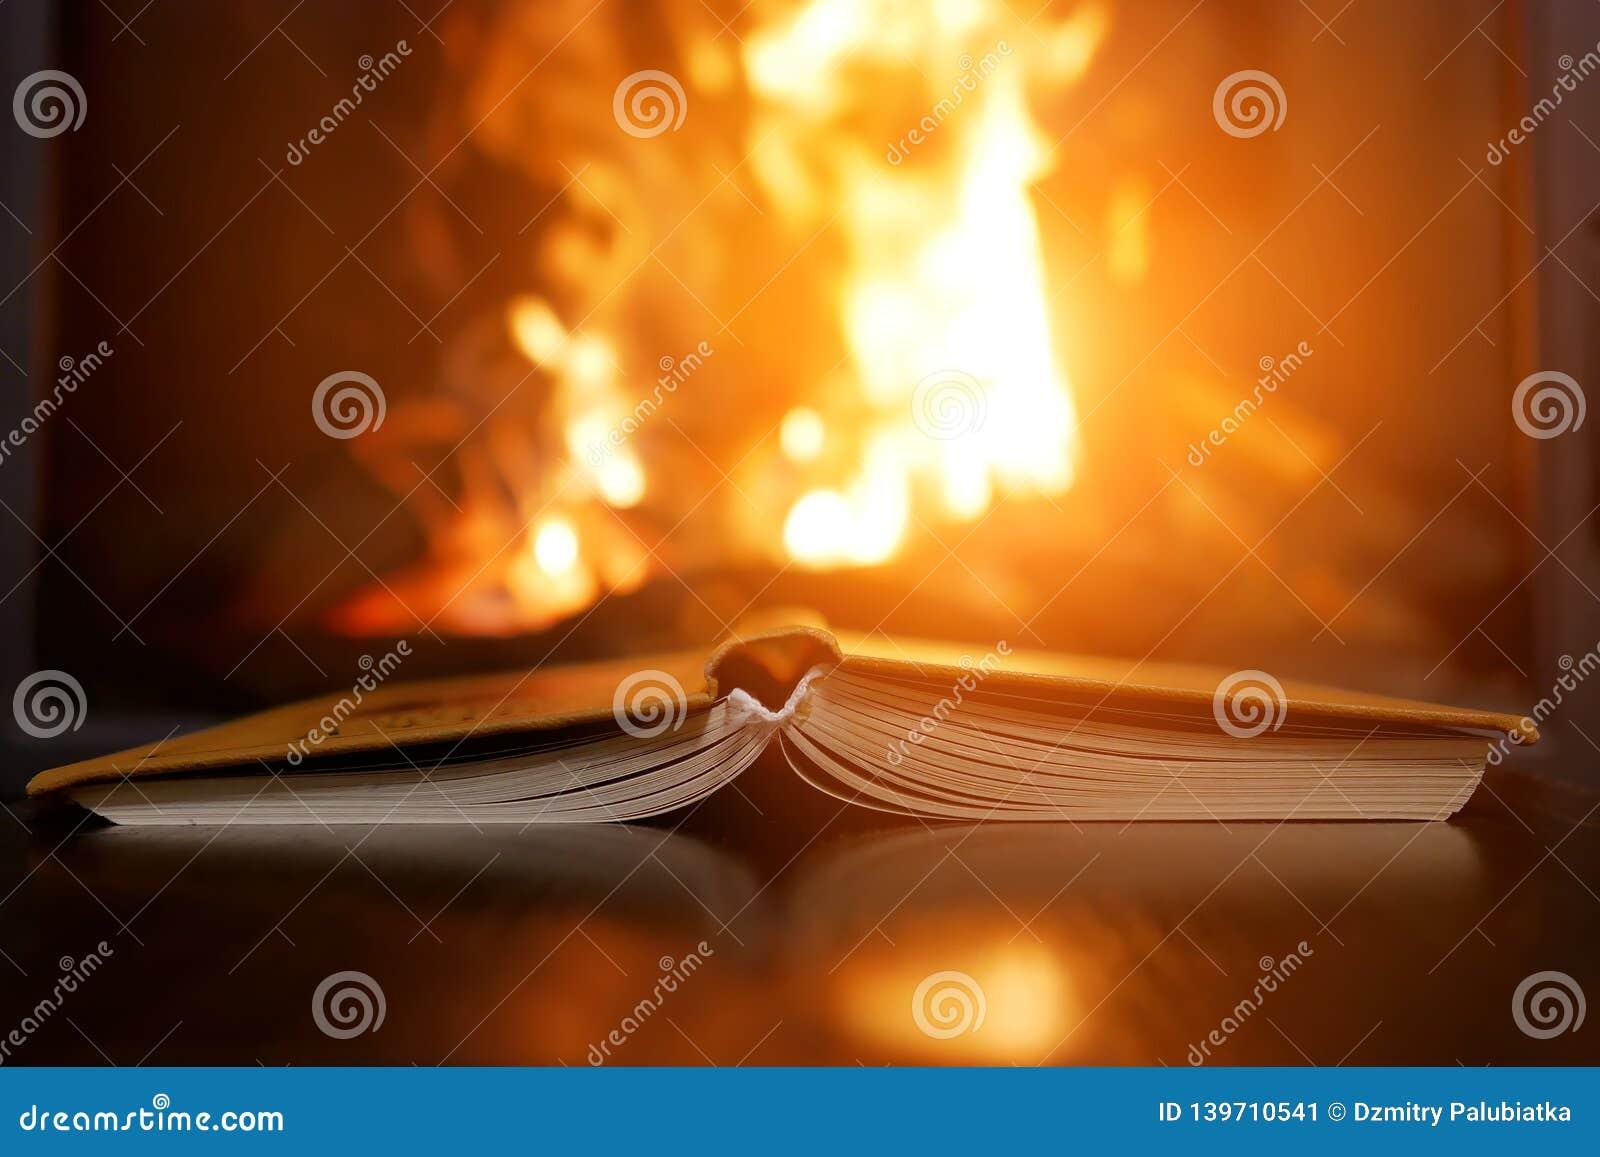 Otwarta książka obok graby